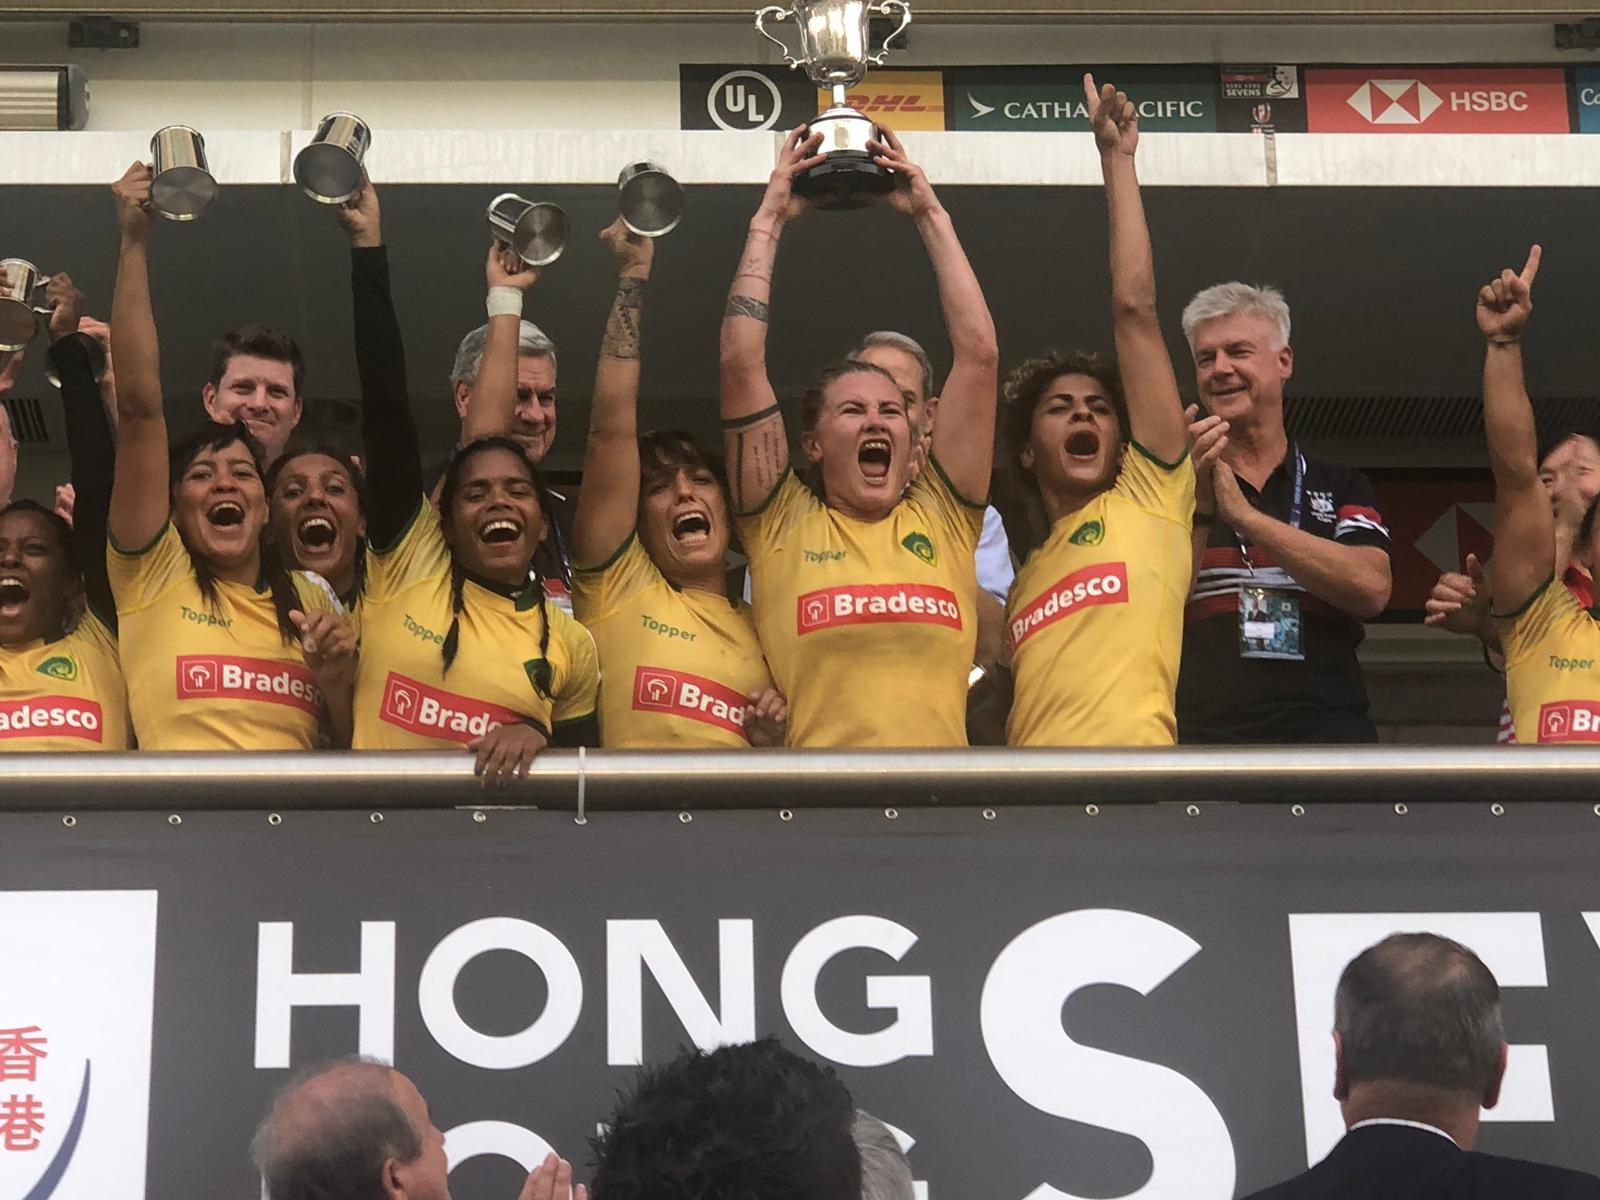 Parabéns Yaras! Clasifican al World Rugby 7s